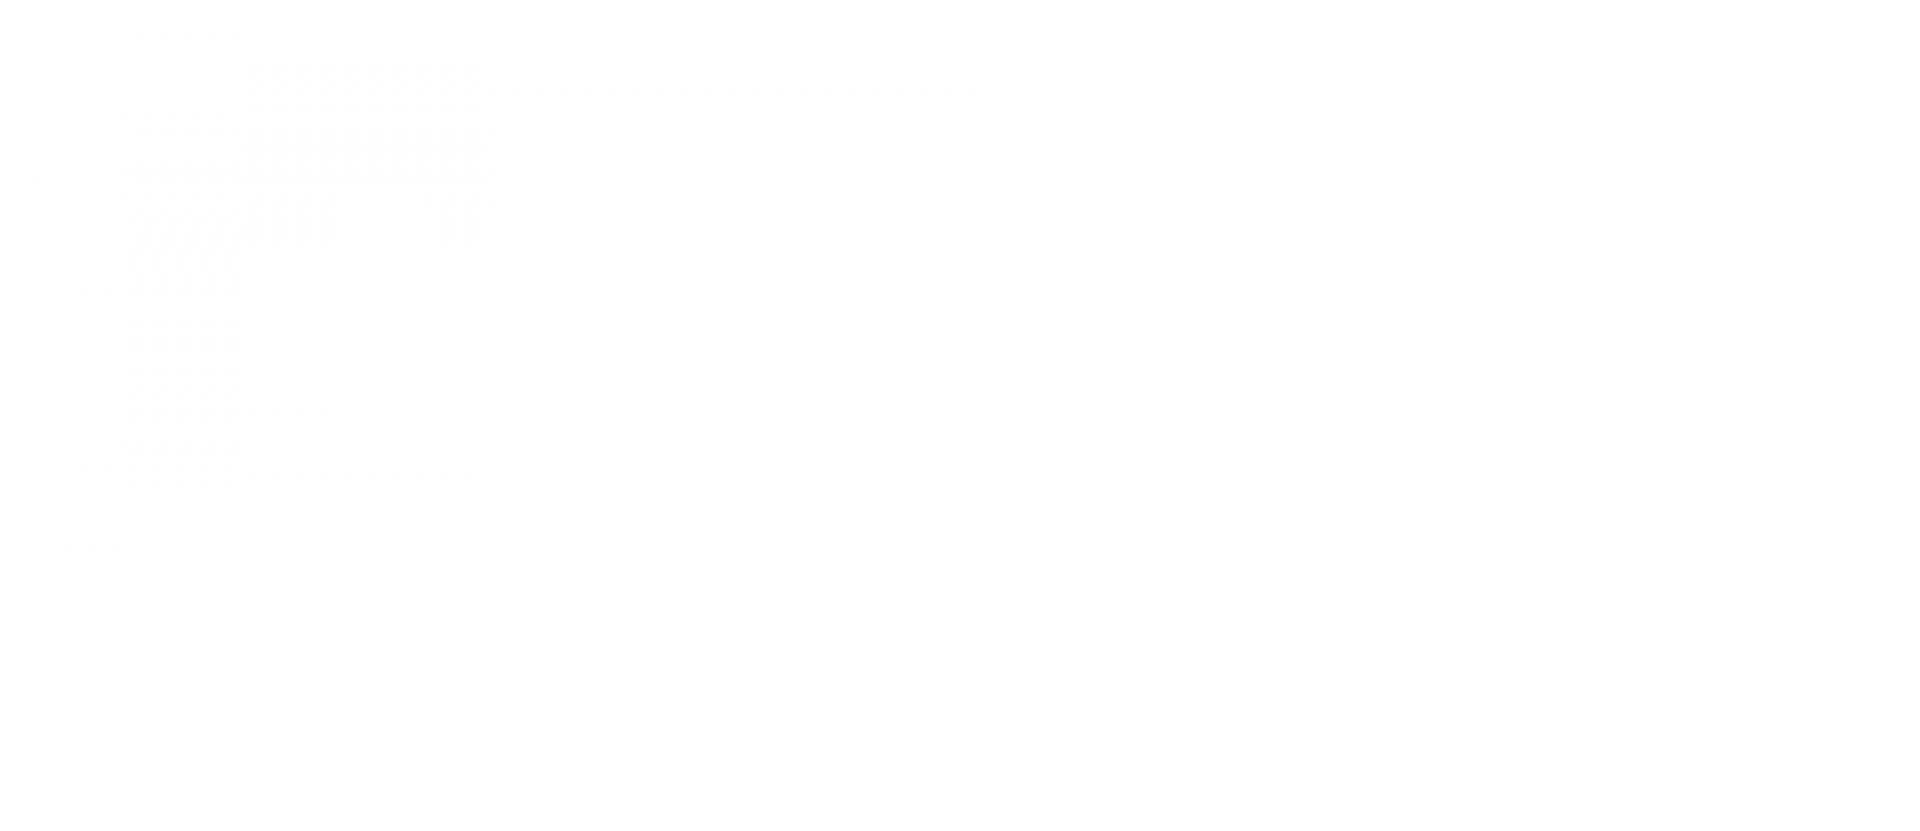 Marketingpaket Künstler Bauträger Individuell Ärzte Handwerker Hannover